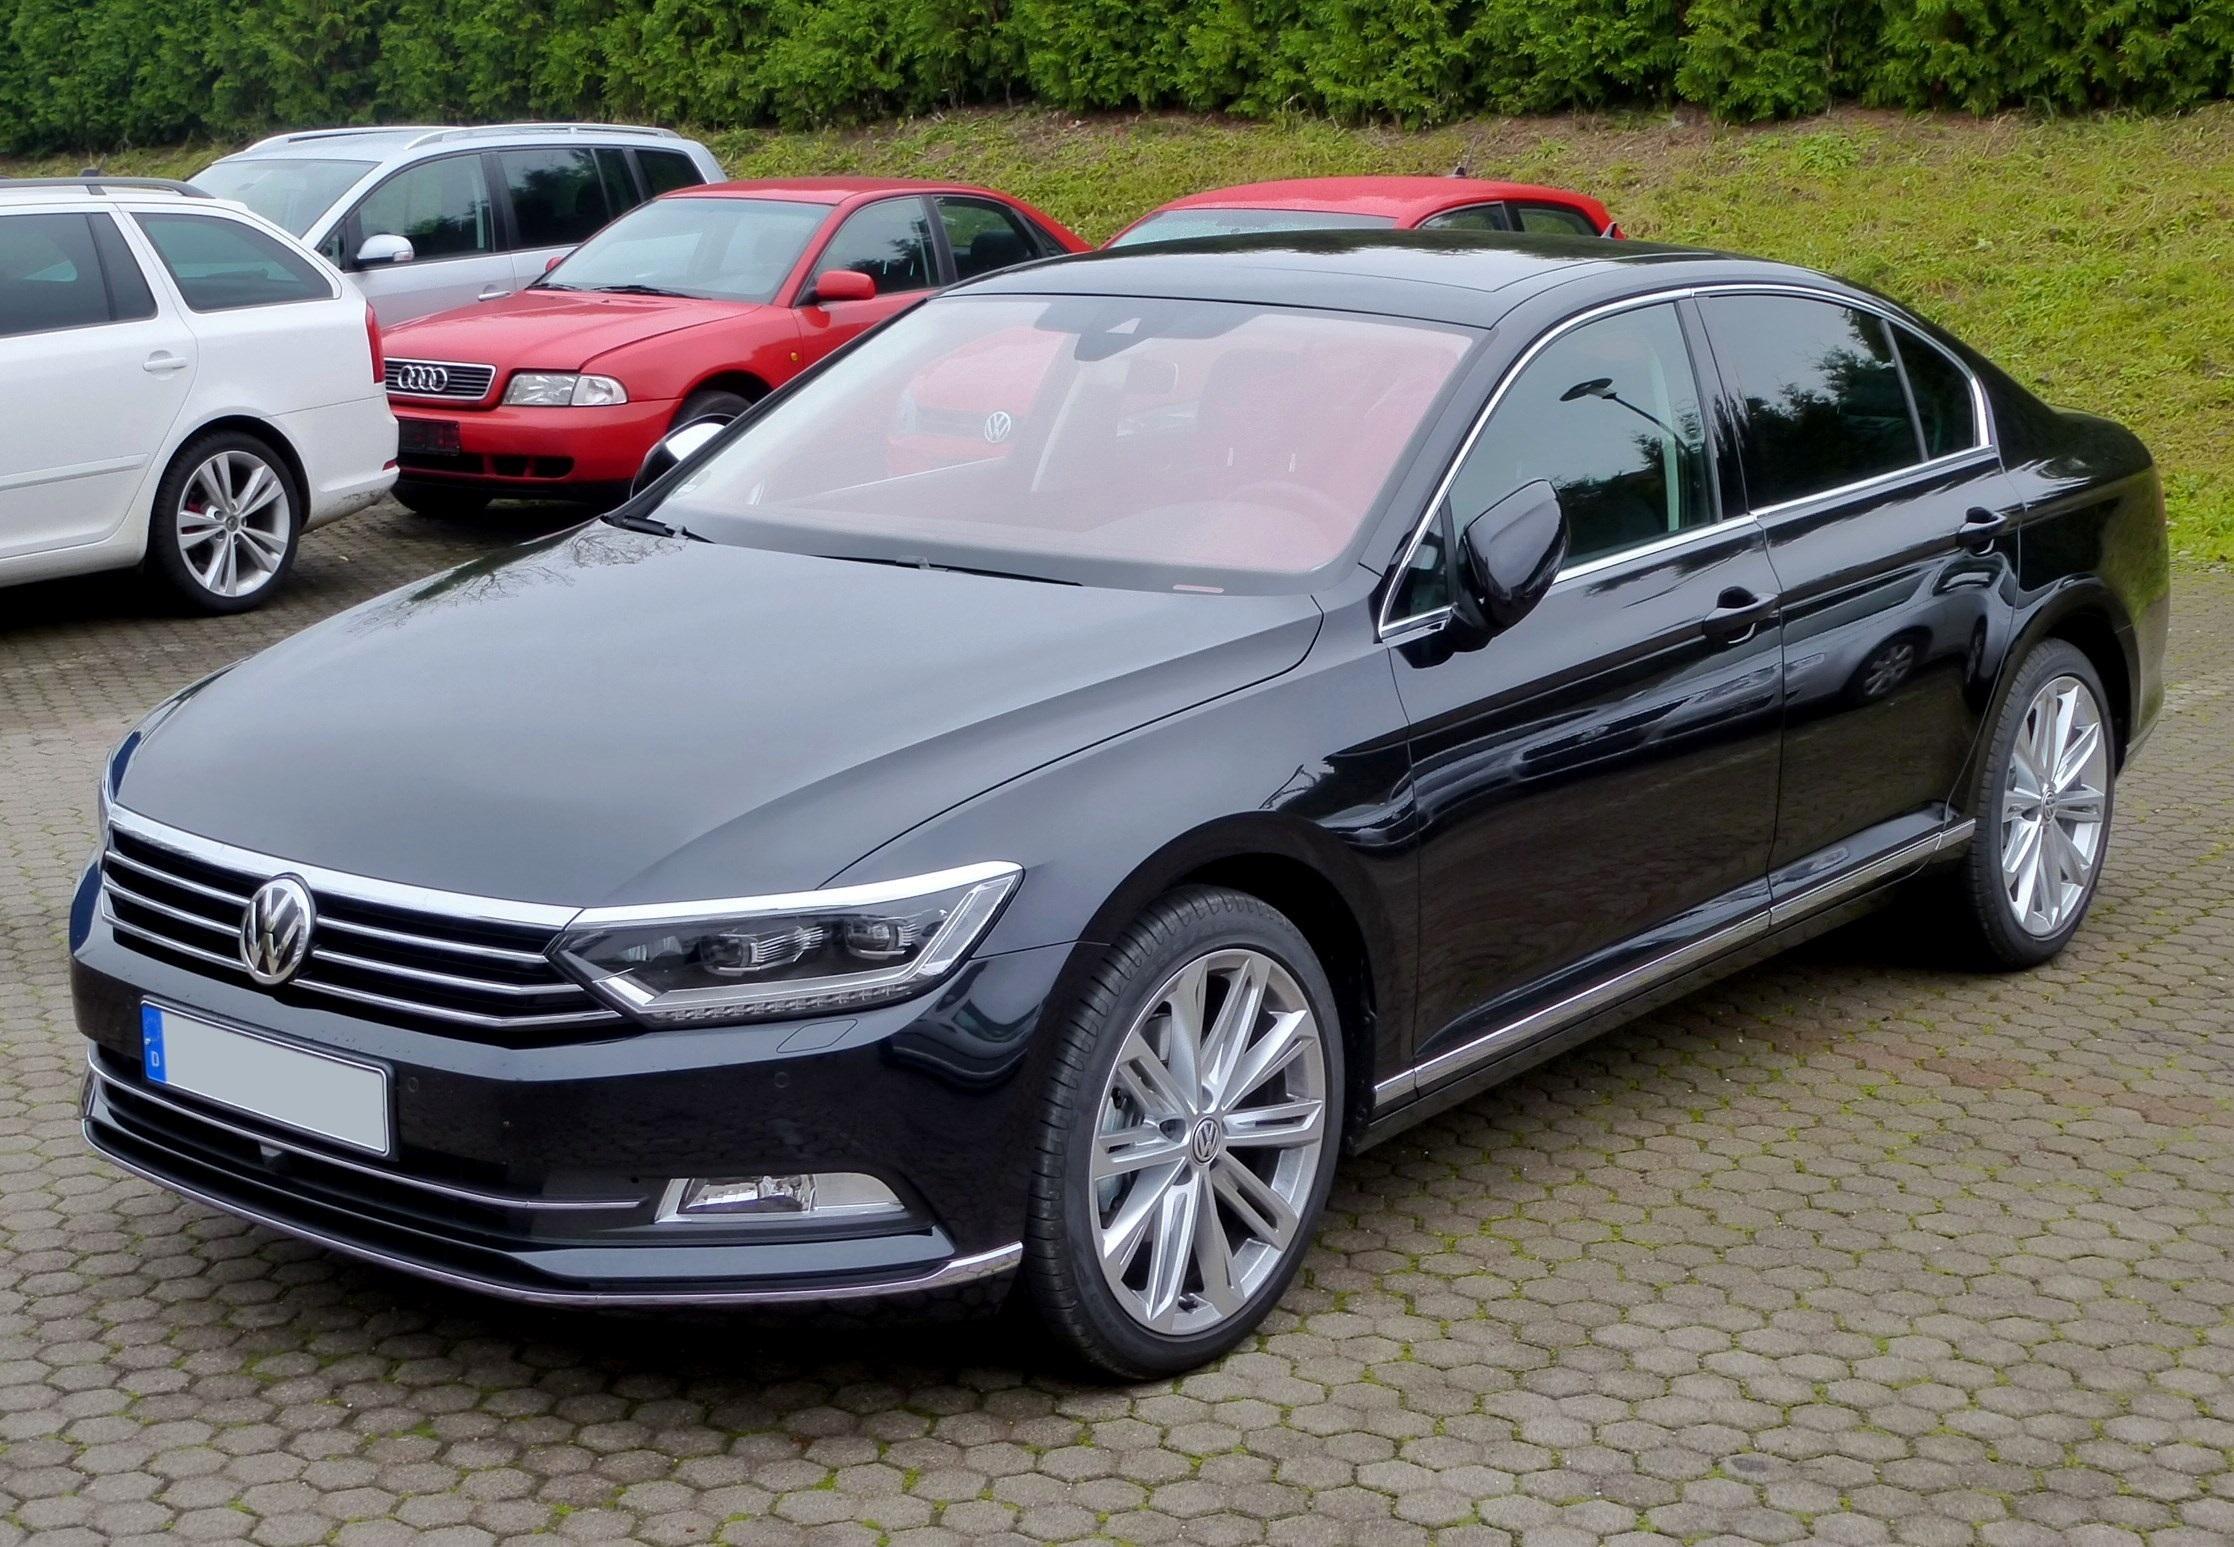 VW Passat Jahreswagen Privatleasing: 183 Euro im Monat bei 10TKM p.a. - Kilometerleasing